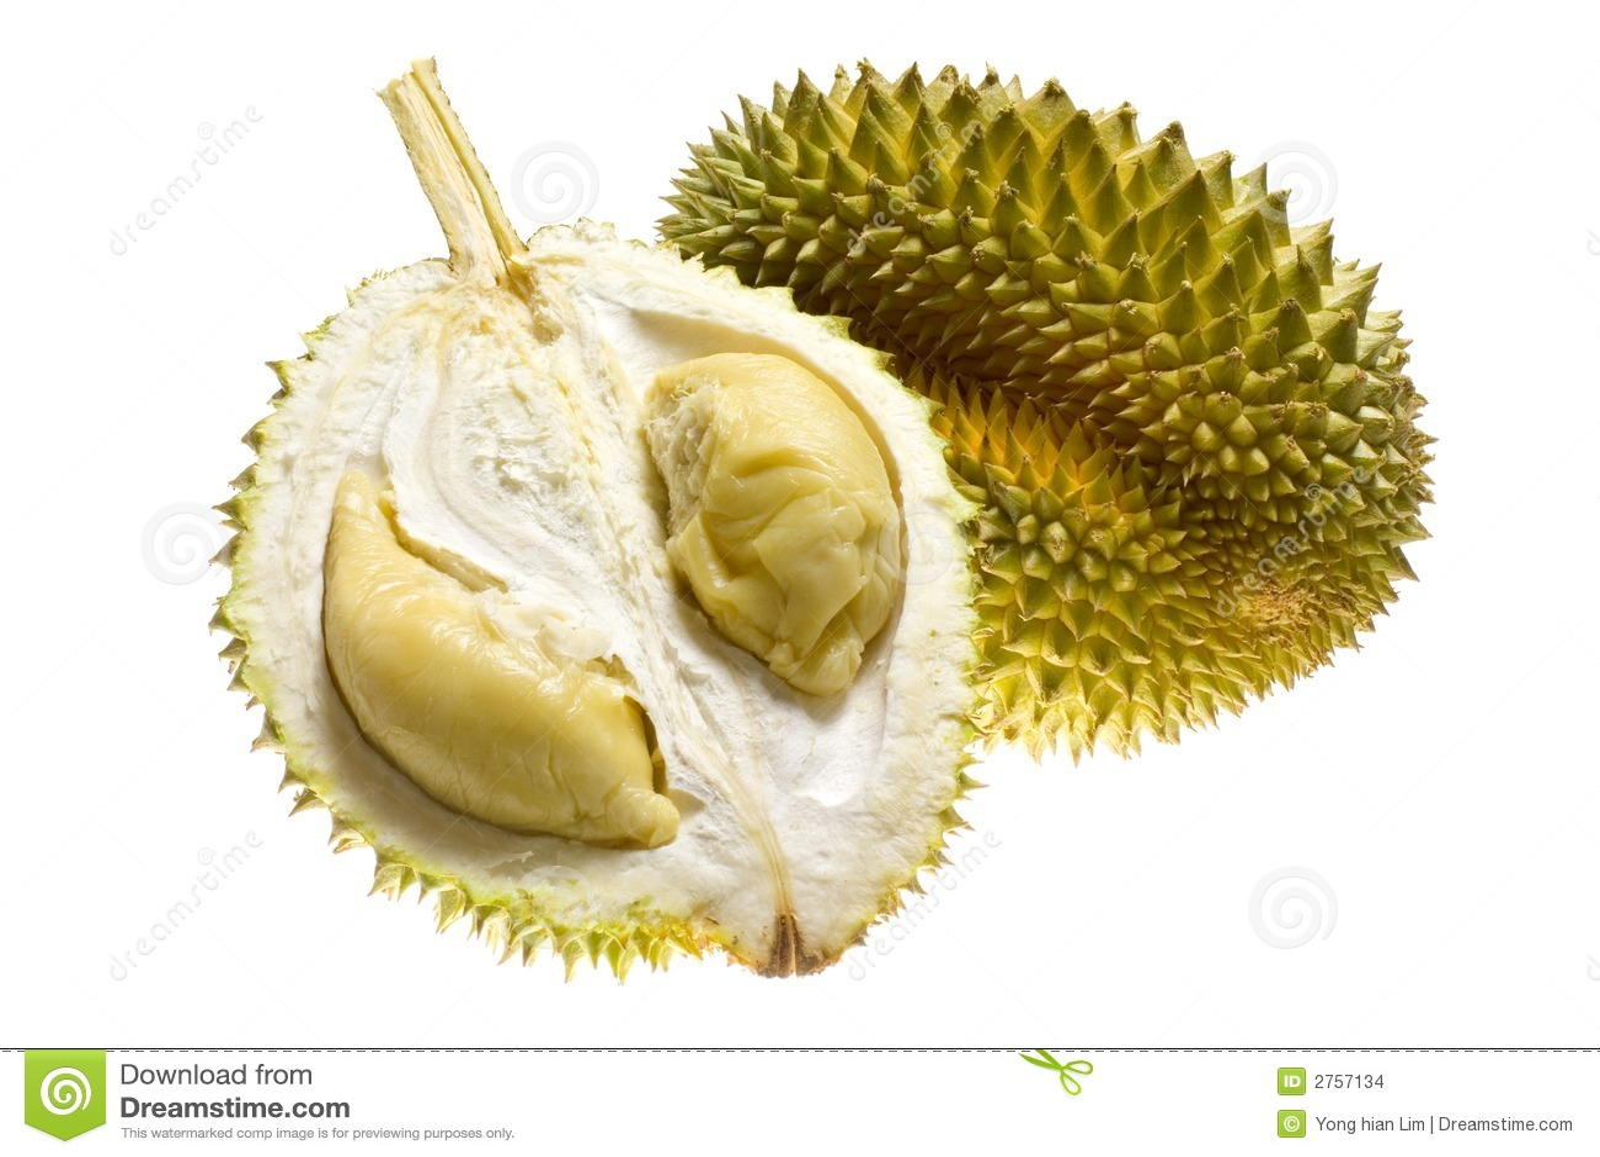 Tropical fruit - Durian